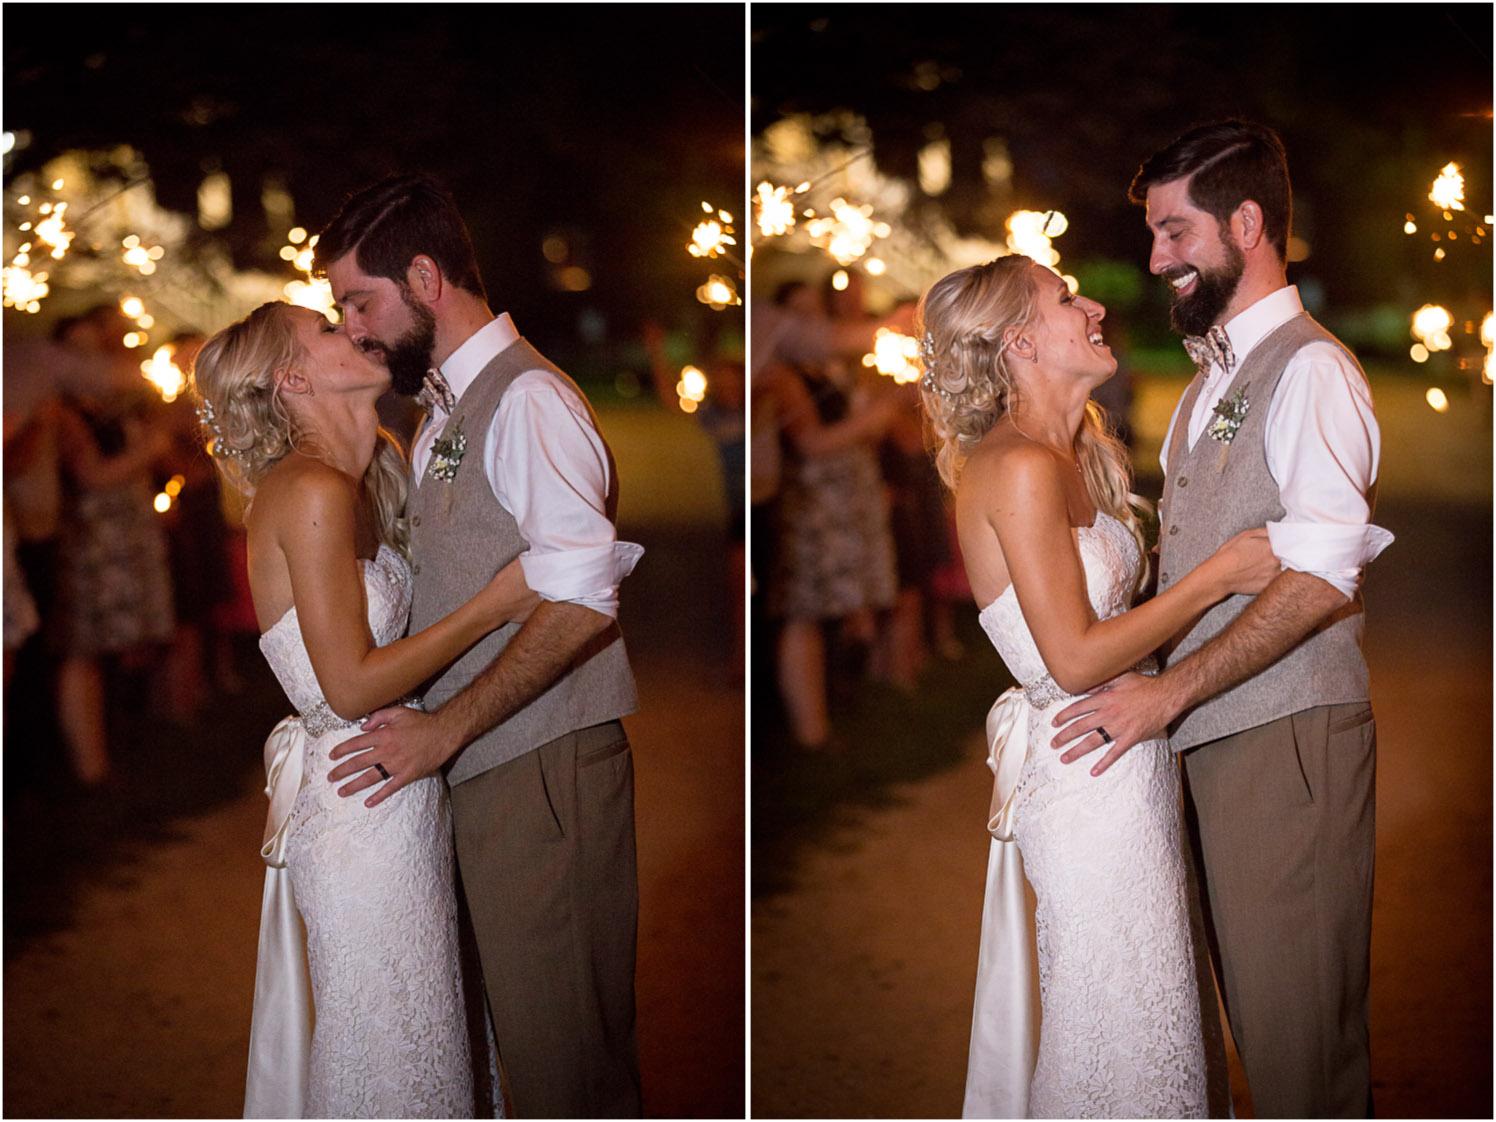 33-dellwood-barn-weddings-minnesota-wedding-photographer-summer-reception-night-photos-bride-groom-sparkler-exit-fun-mahonen-photography.jpg